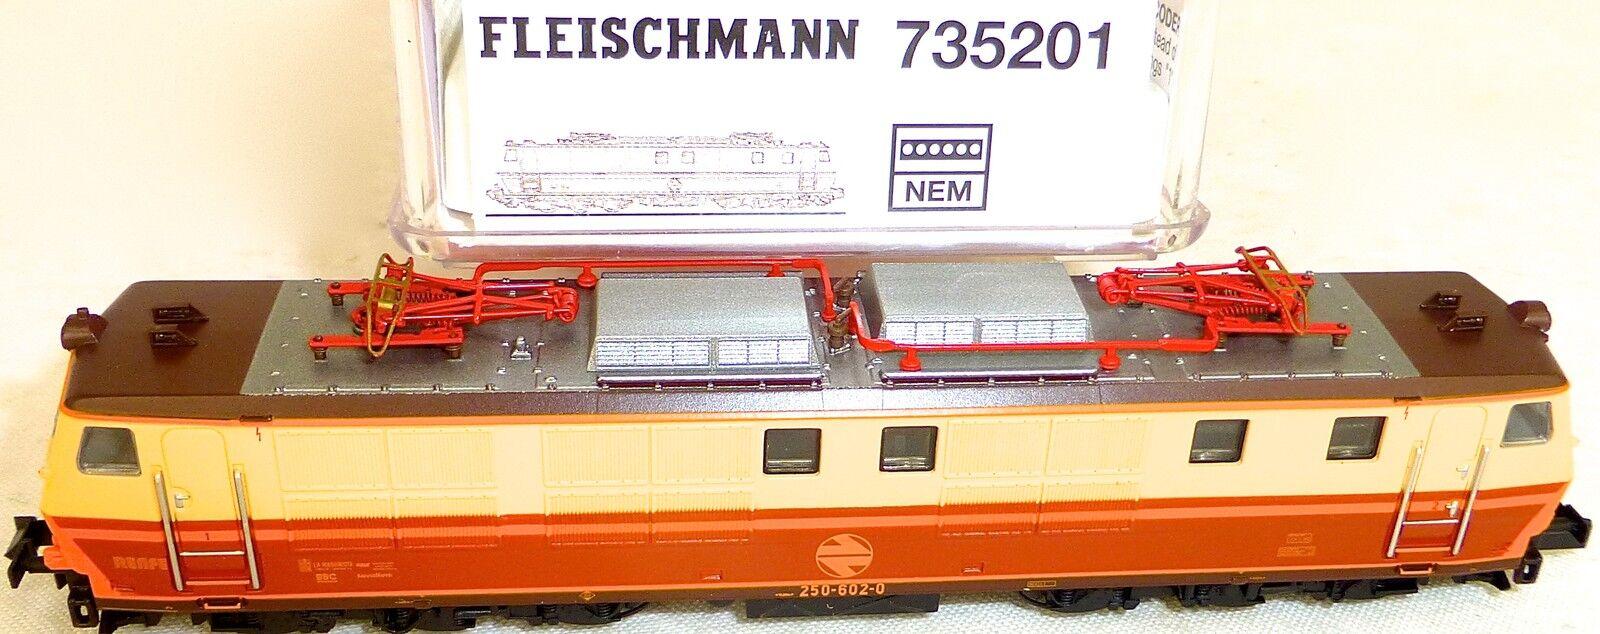 250 Estrella Renfe Ep4 Dss Dss Dss Kkk Fleischmann 735201 Voie N 1 160 Hs3 Μ 9efc8d